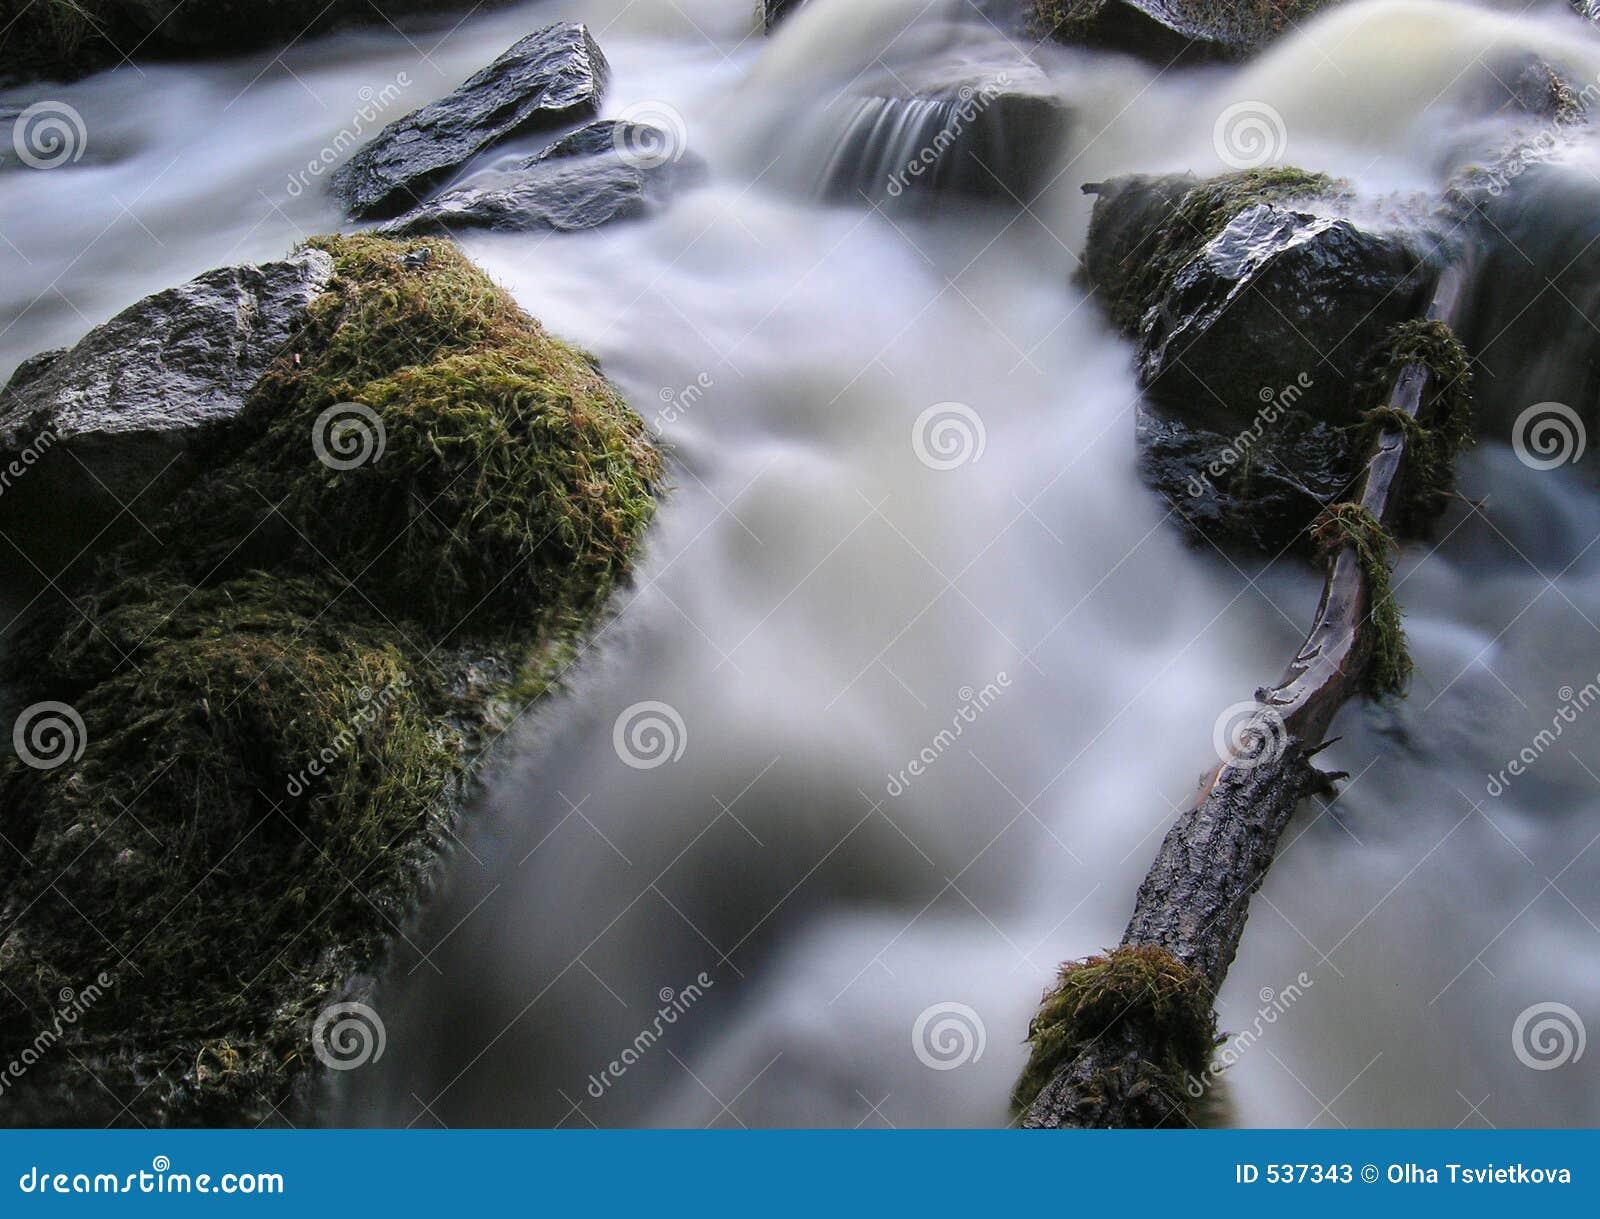 Download 魔术瀑布 库存图片. 图片 包括有 幸福, 结算, 自由, 小河, 生态, 背包, 灰色, 线路, 绿叶, browne - 537343